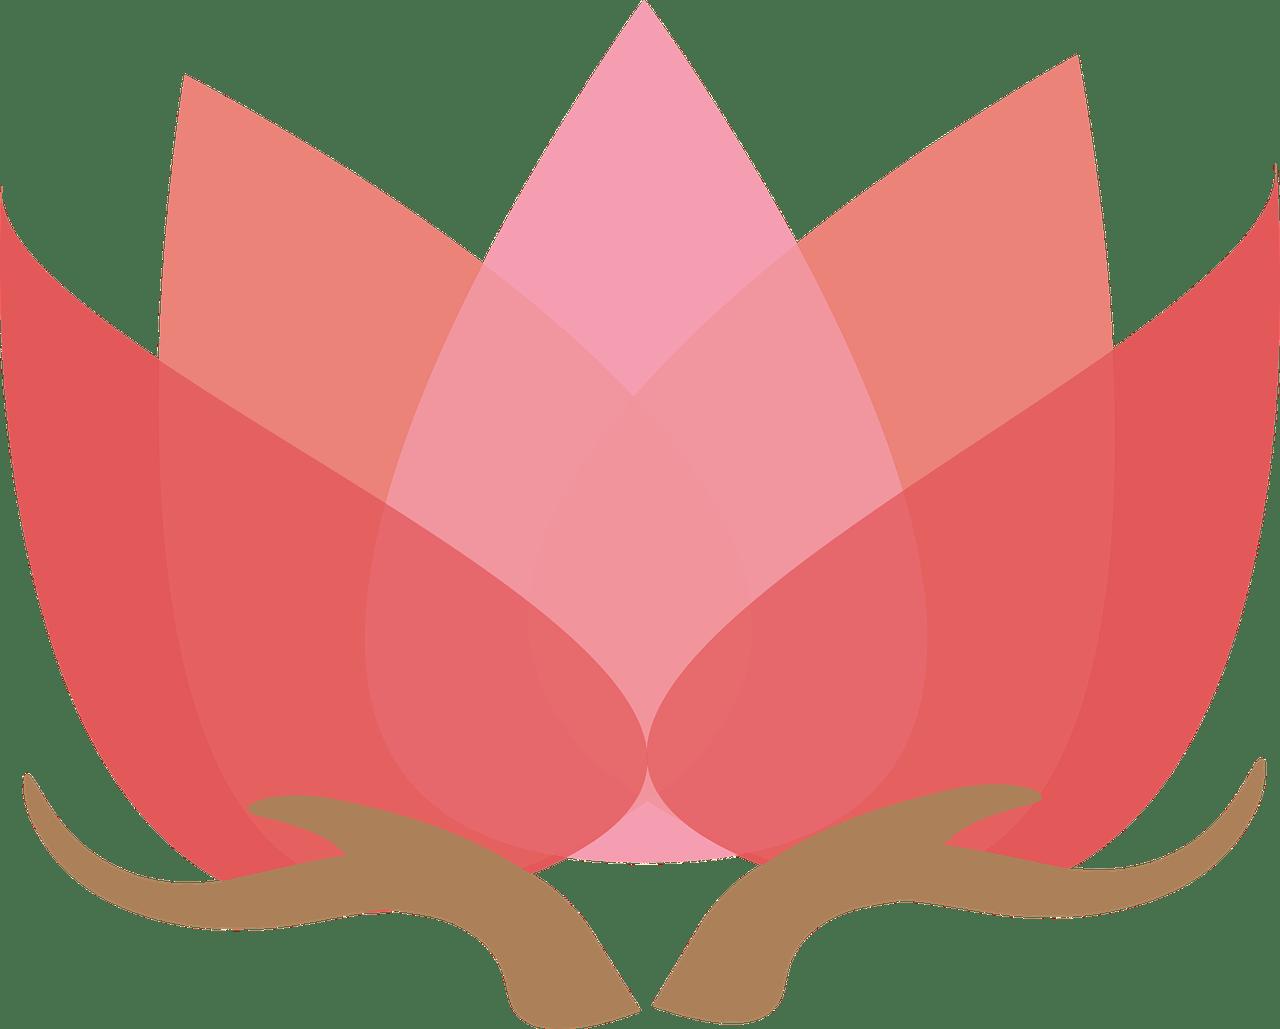 Lotus clipart esthetician. Energy medicine reiki hands